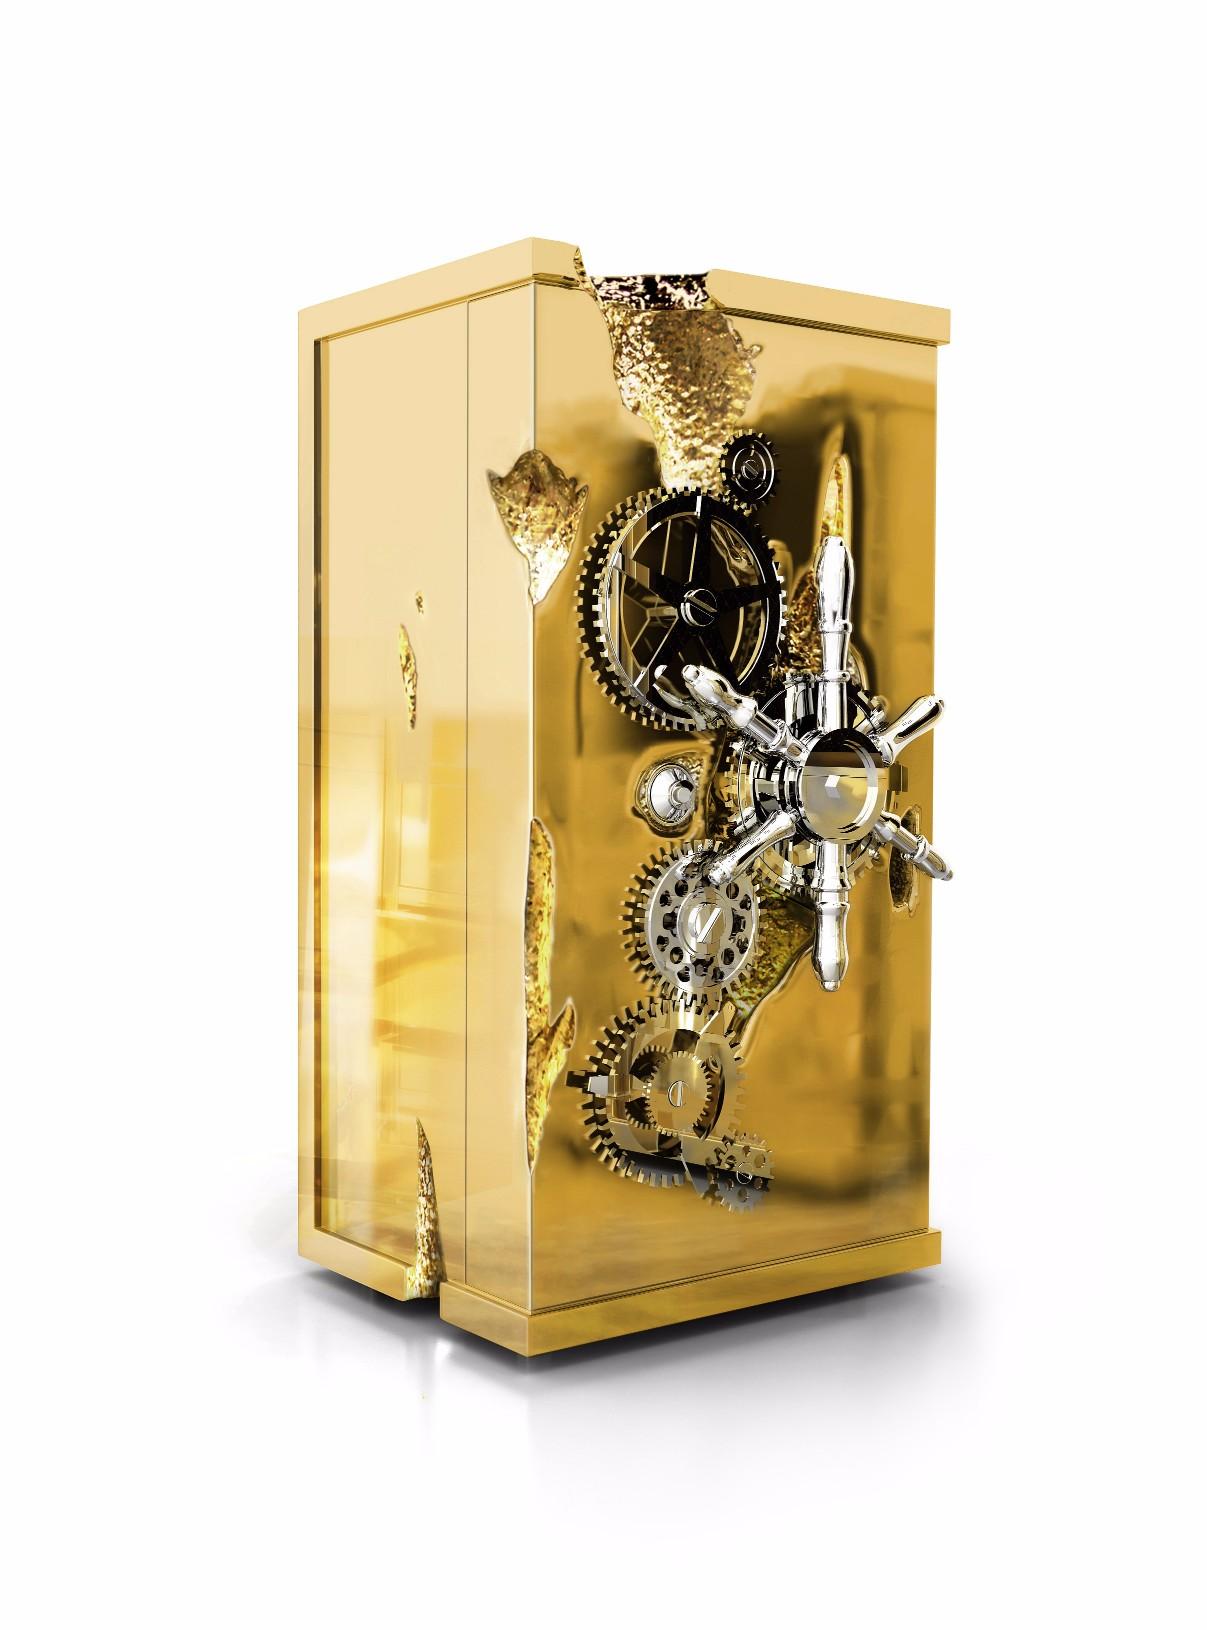 Millionaire Collection: The World's Finest Safes